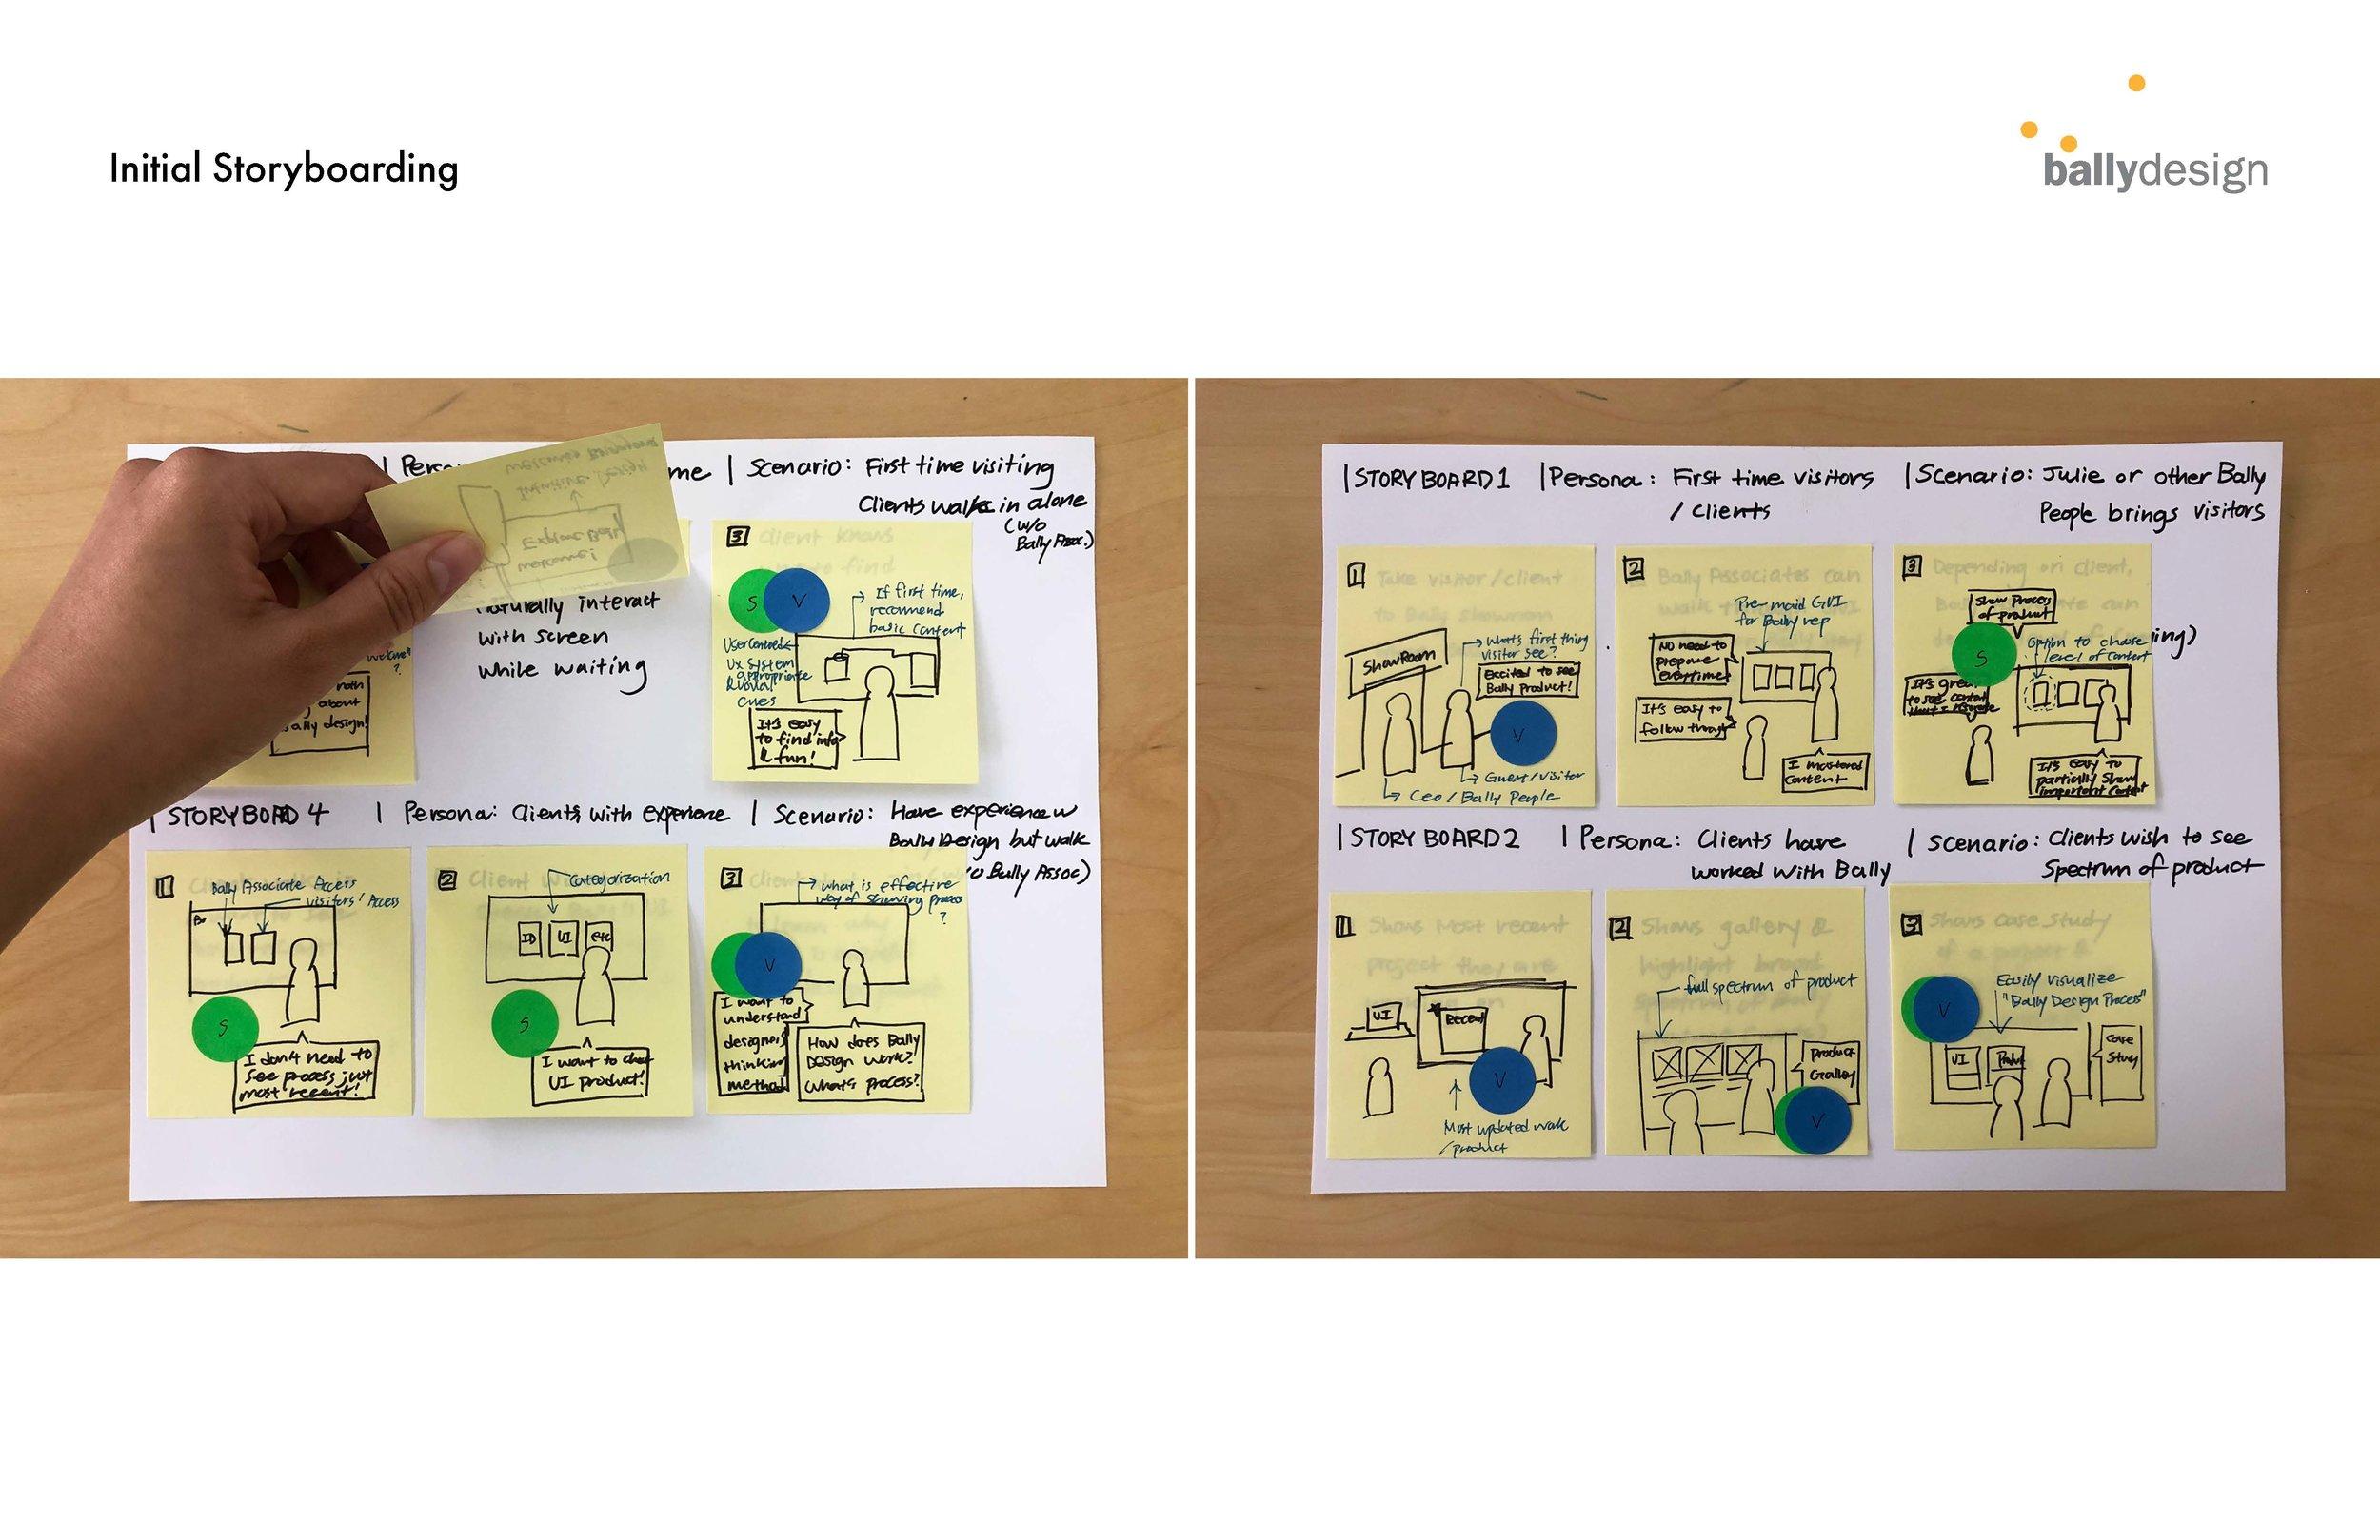 Real_Internship Final Presentation_Page_52.jpg